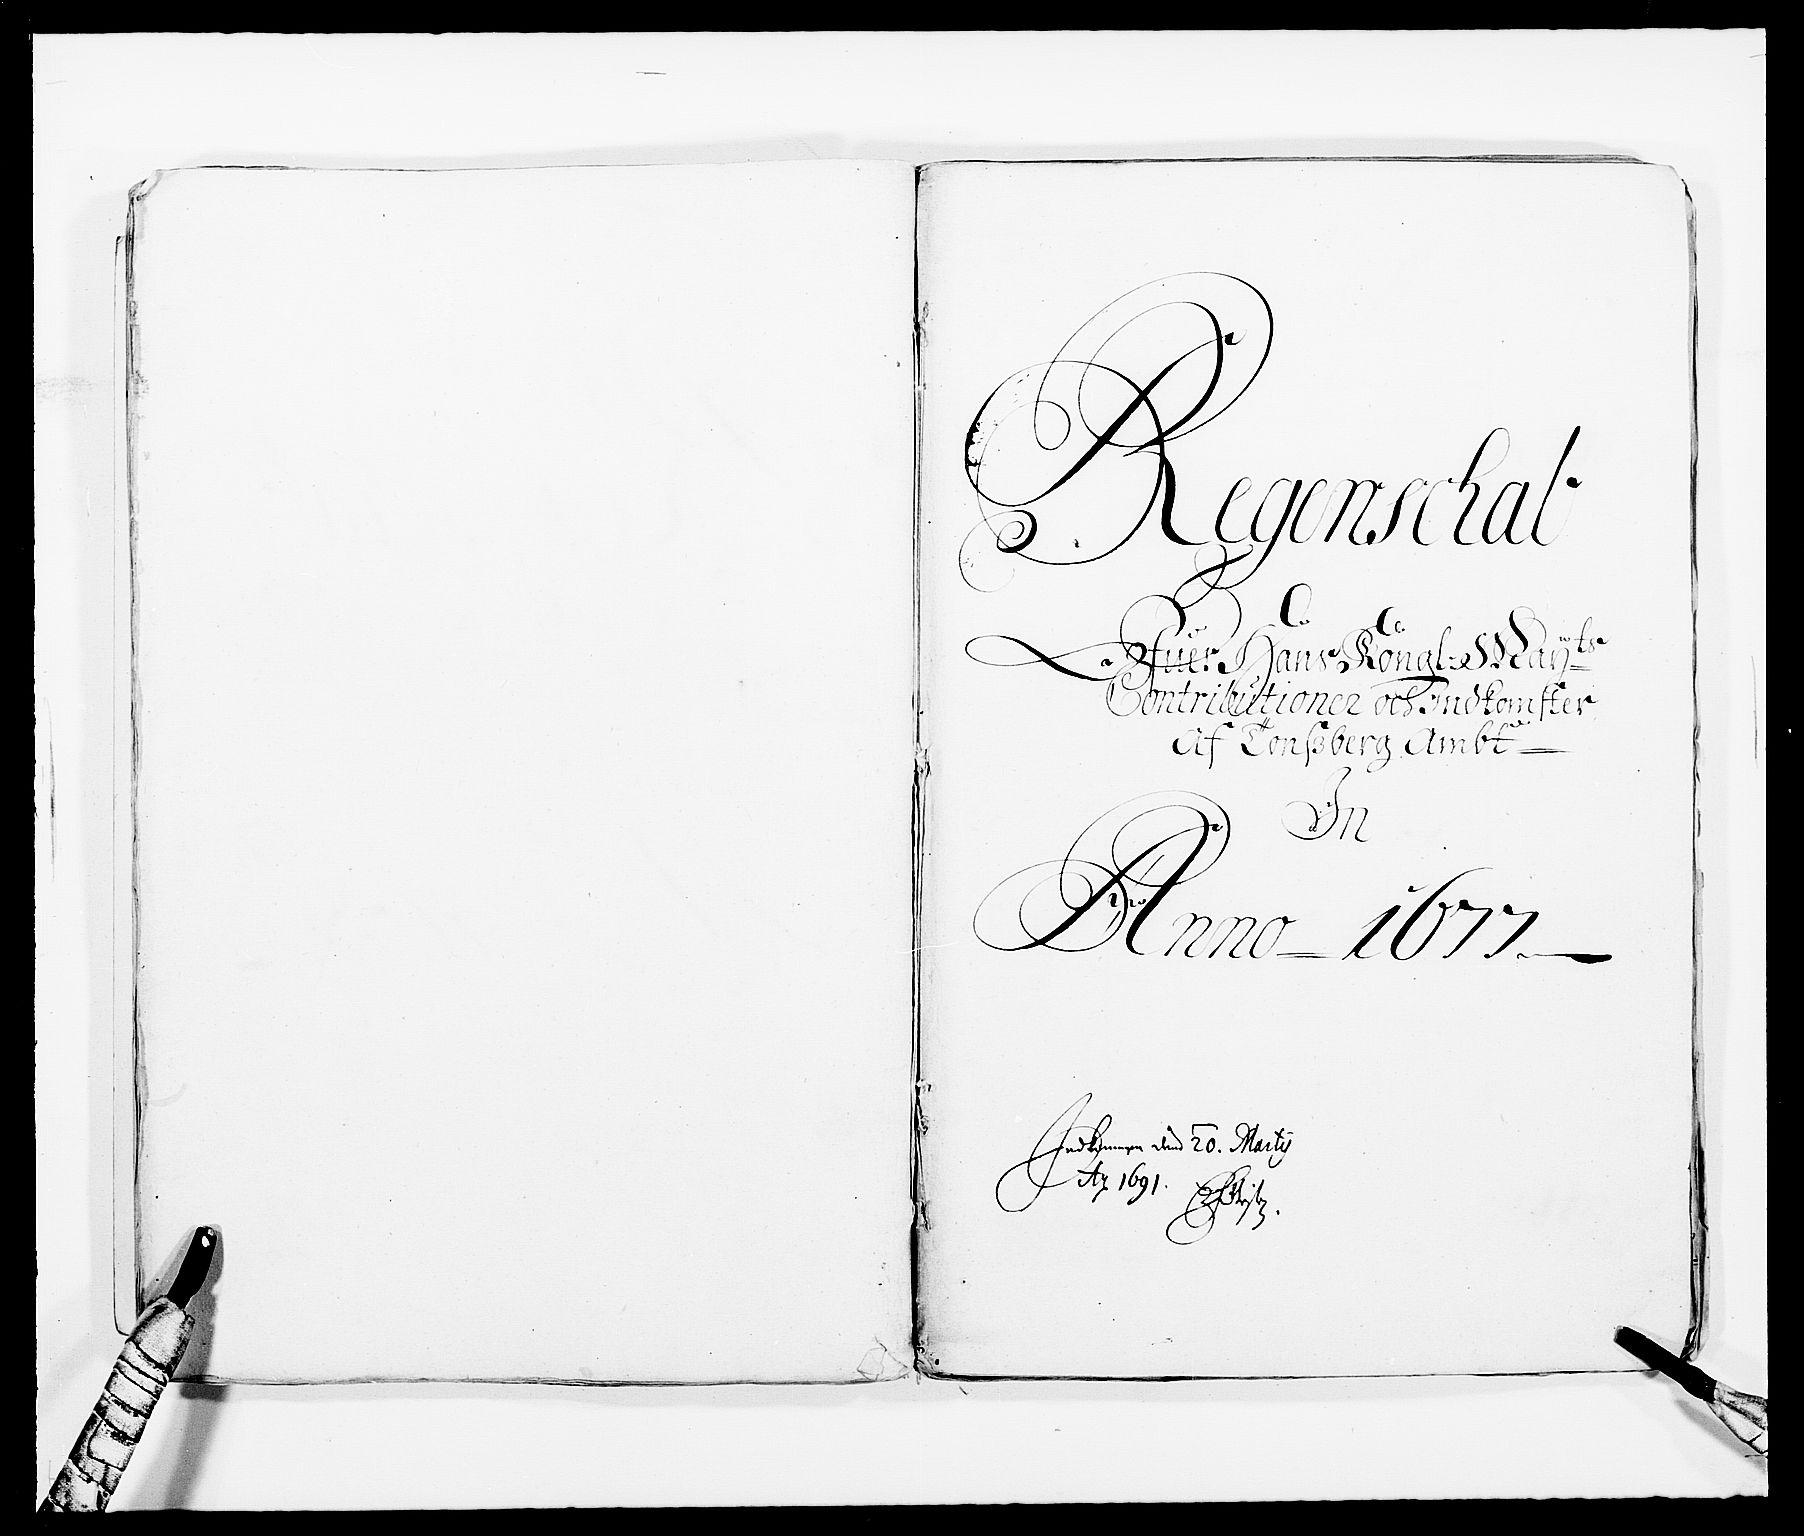 RA, Rentekammeret inntil 1814, Reviderte regnskaper, Fogderegnskap, R32/L1845: Fogderegnskap Jarlsberg grevskap, 1676-1678, s. 18